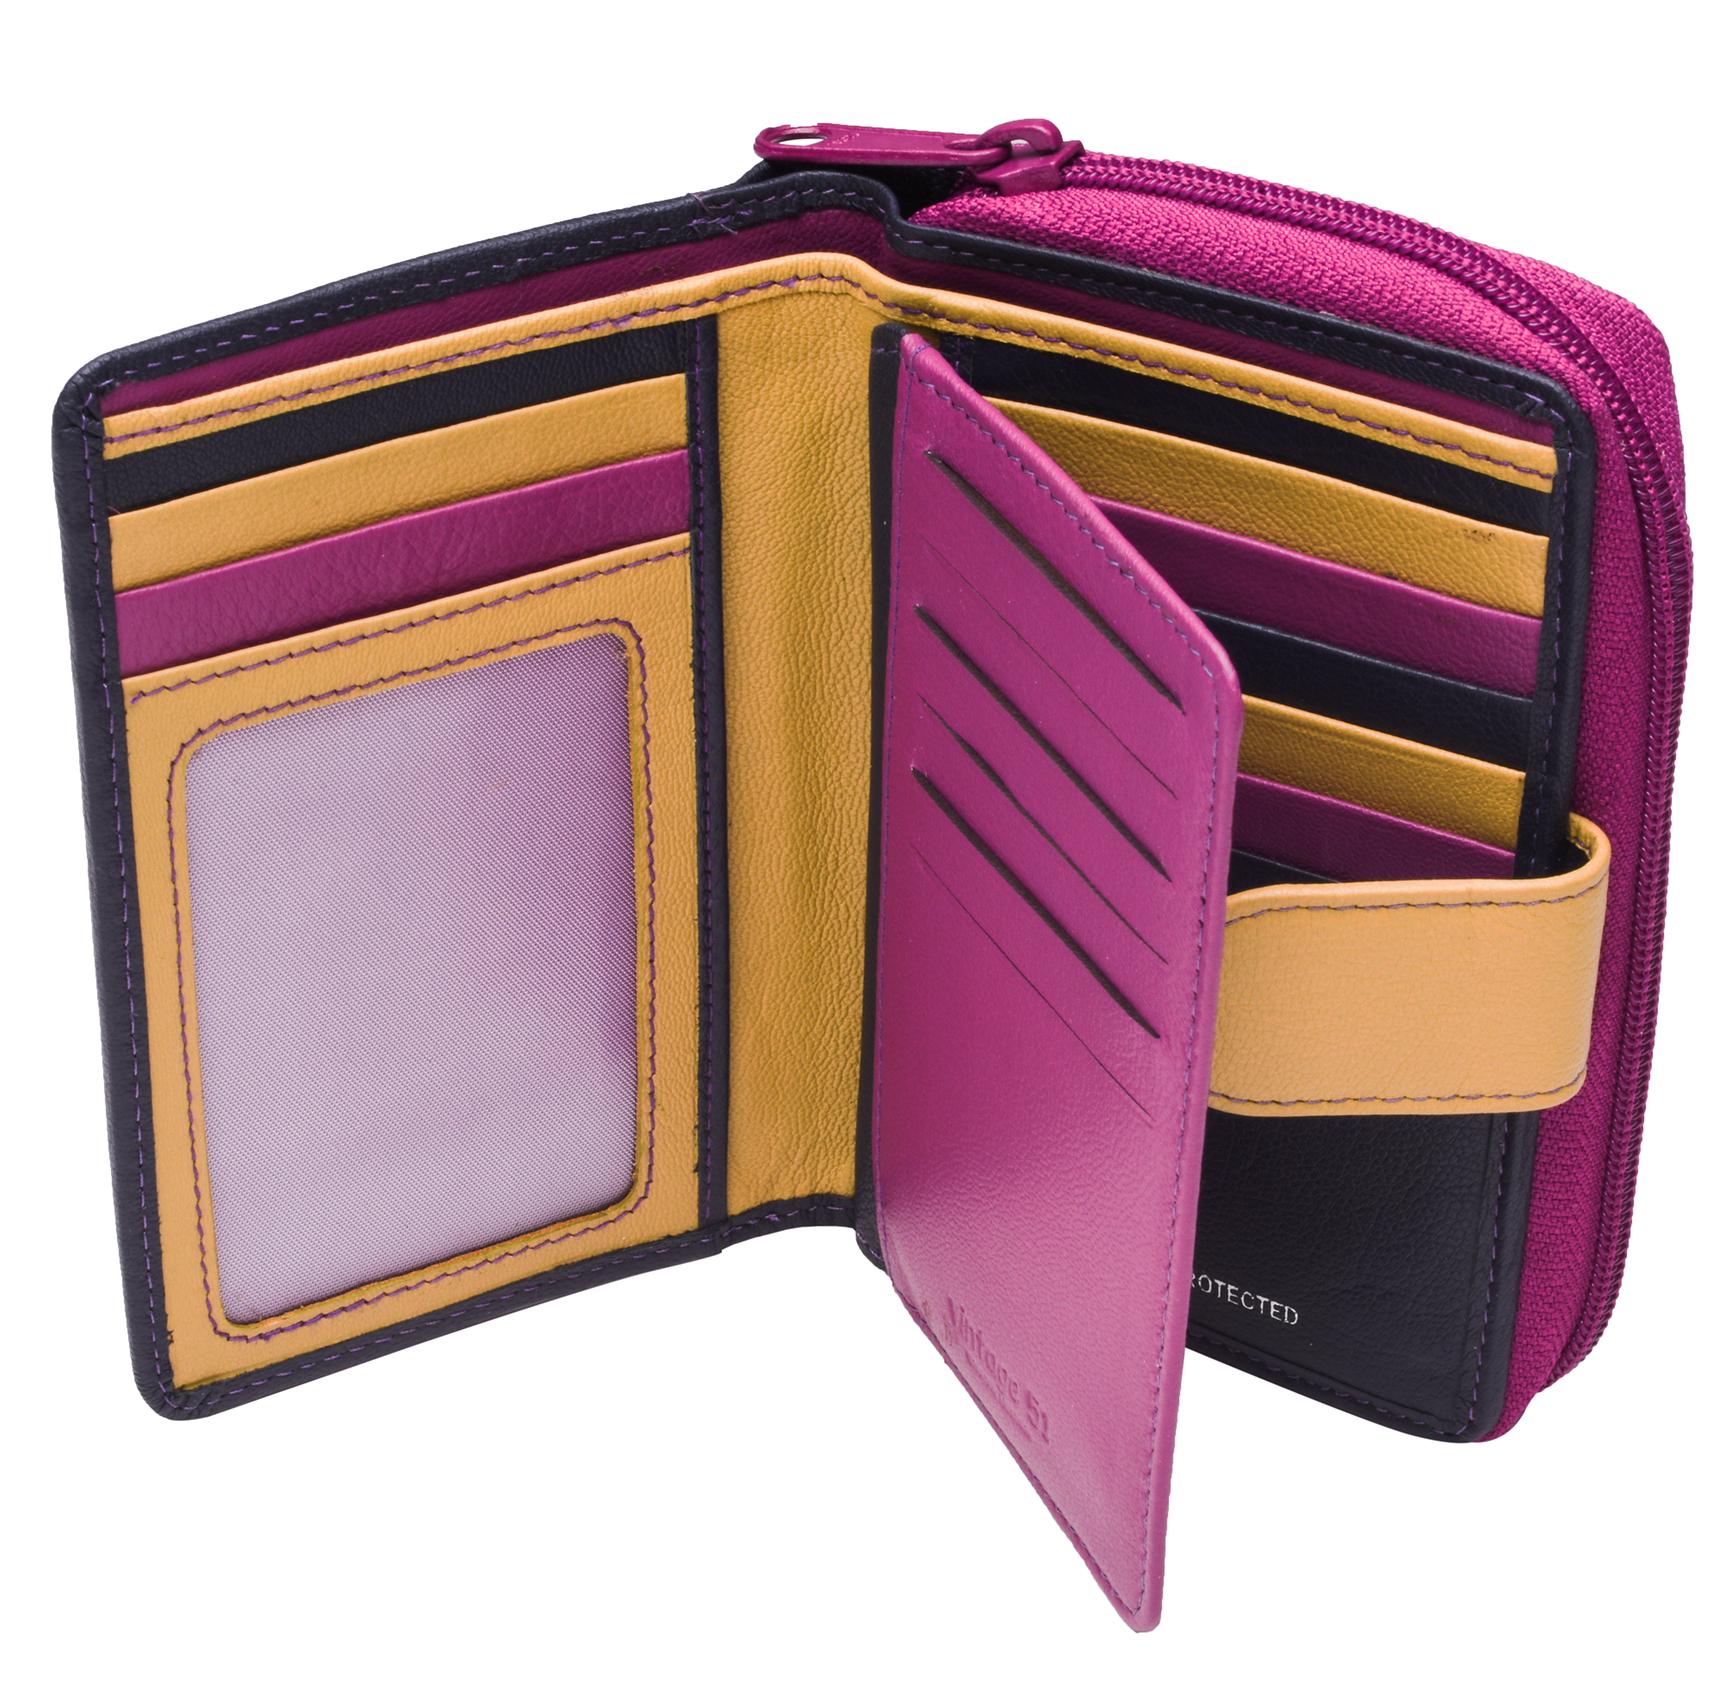 Ladies-Womens-RFID-Blocking-Safe-Leather-Bifold-Medium-Purse-Wallet-Coin-Section thumbnail 4